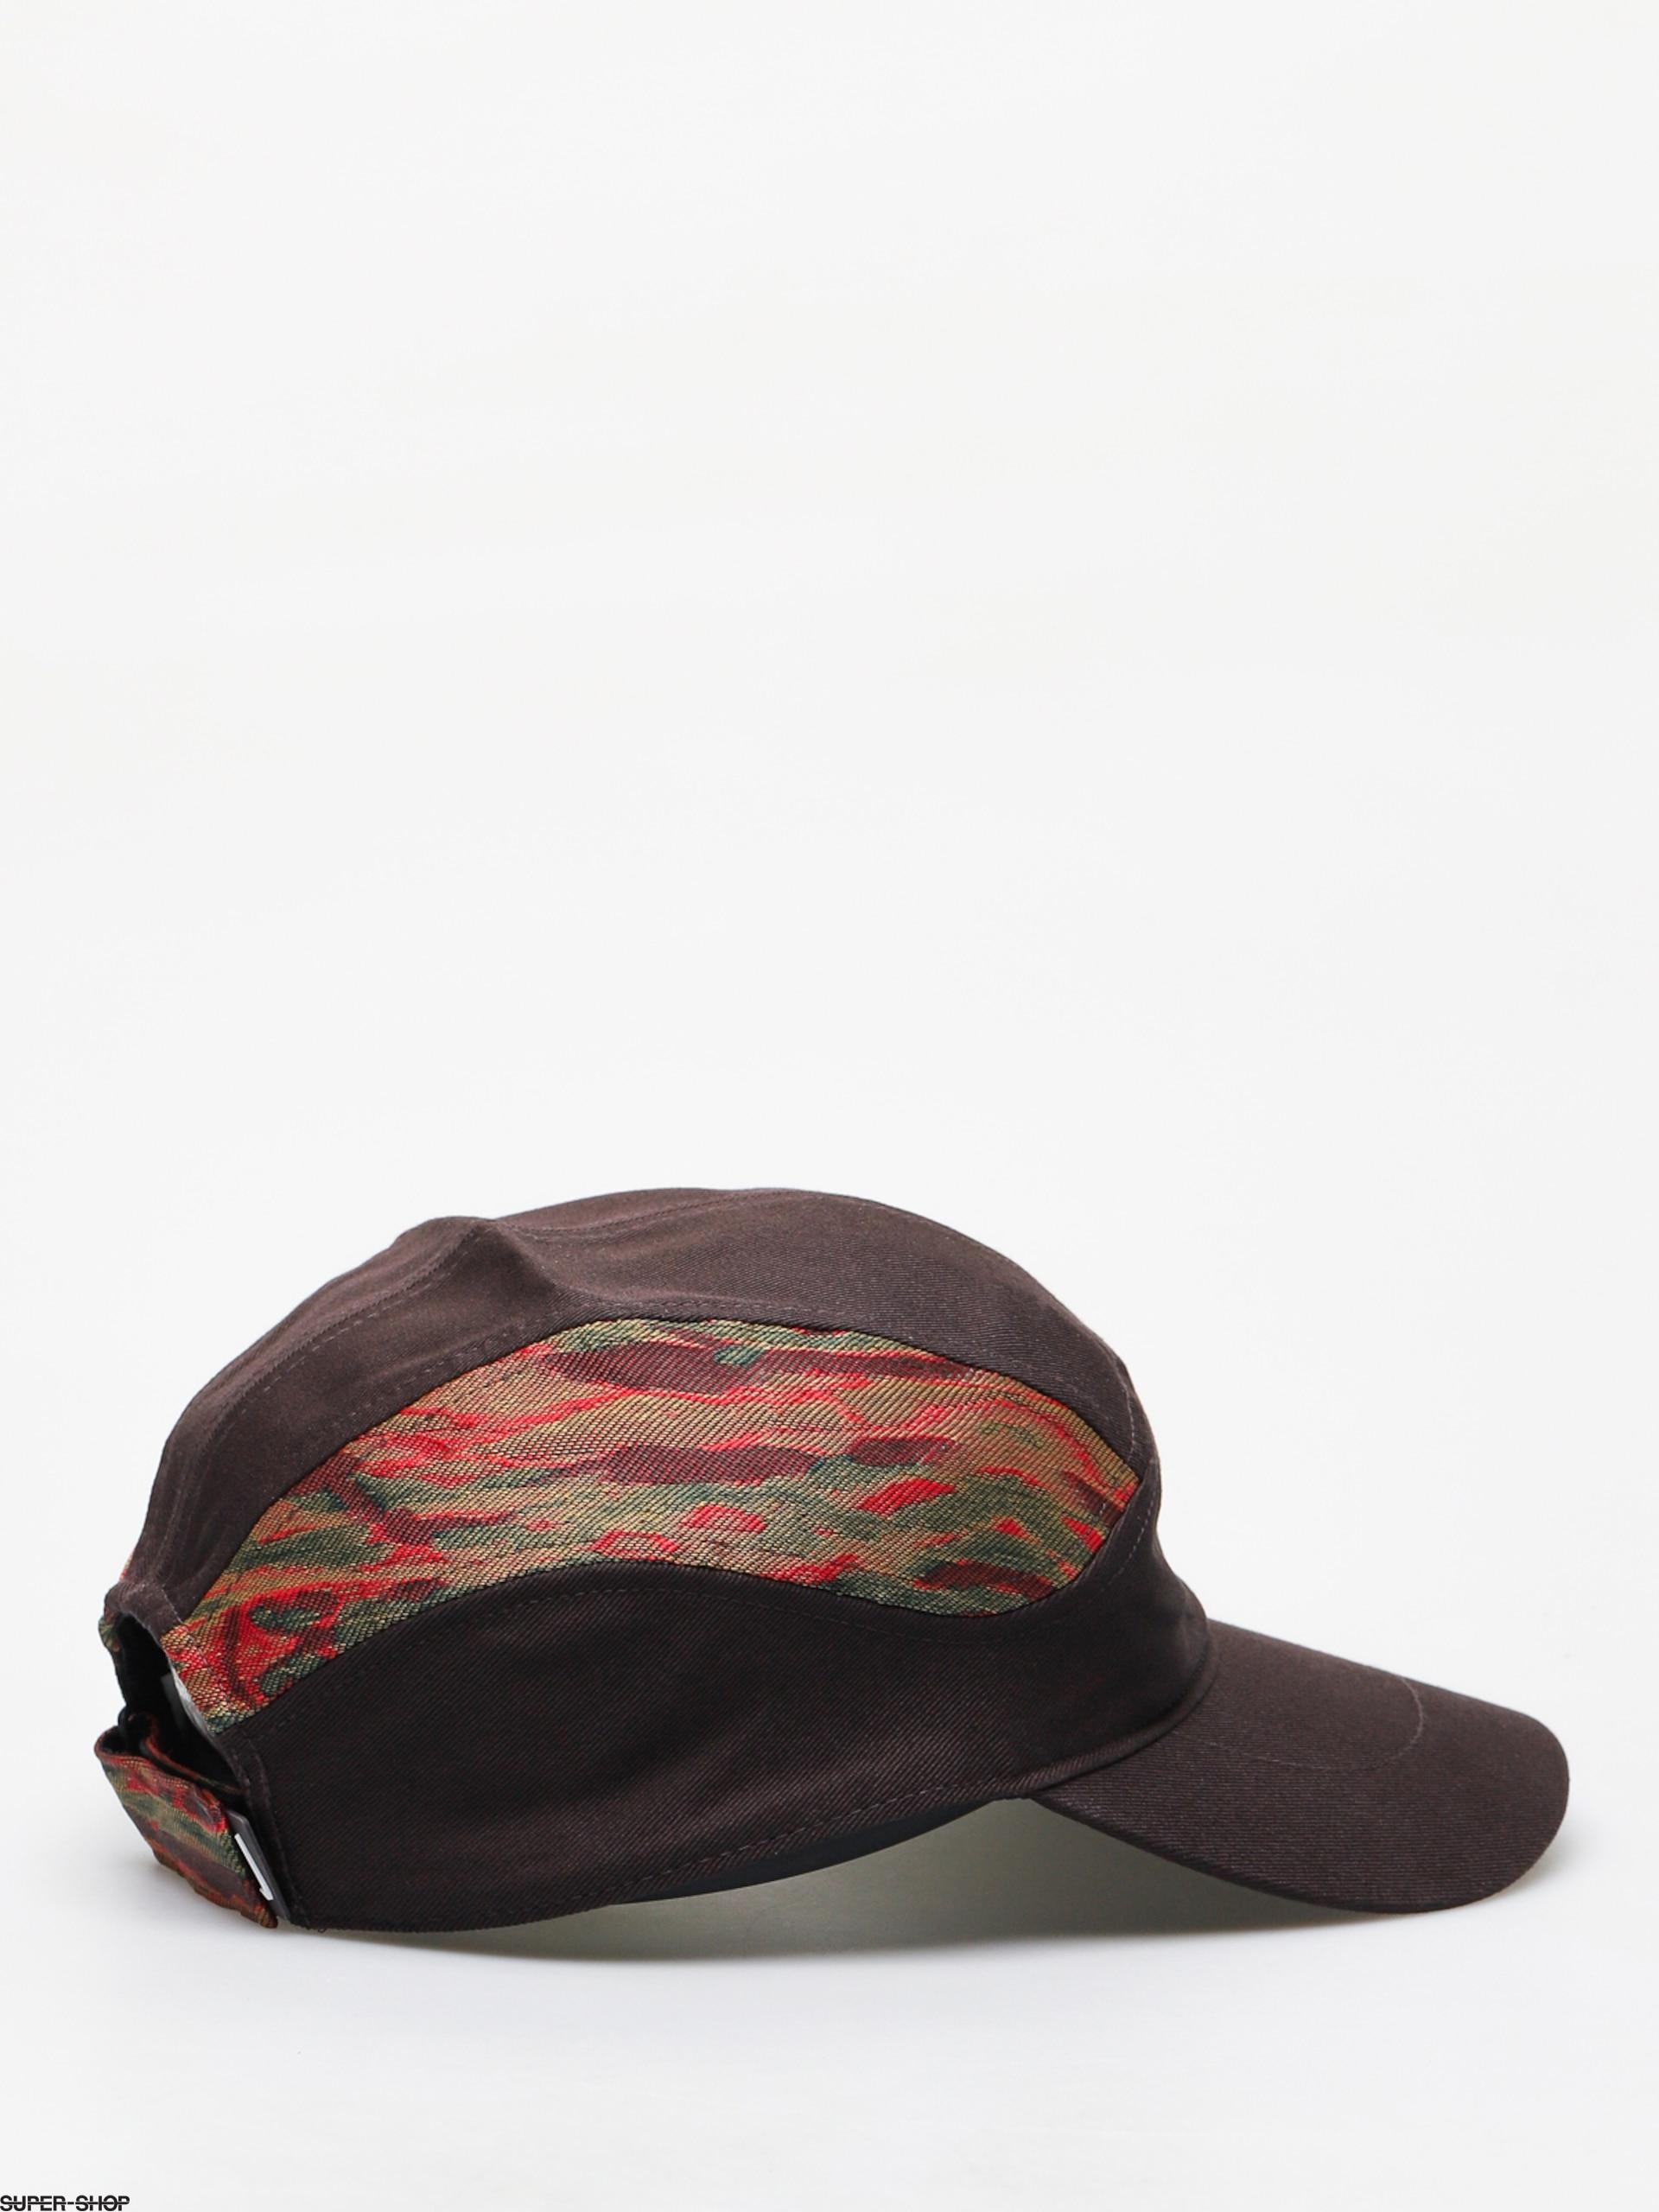 76abc3cdd Nike SB Sb Flatbill Cap (velvet brown)